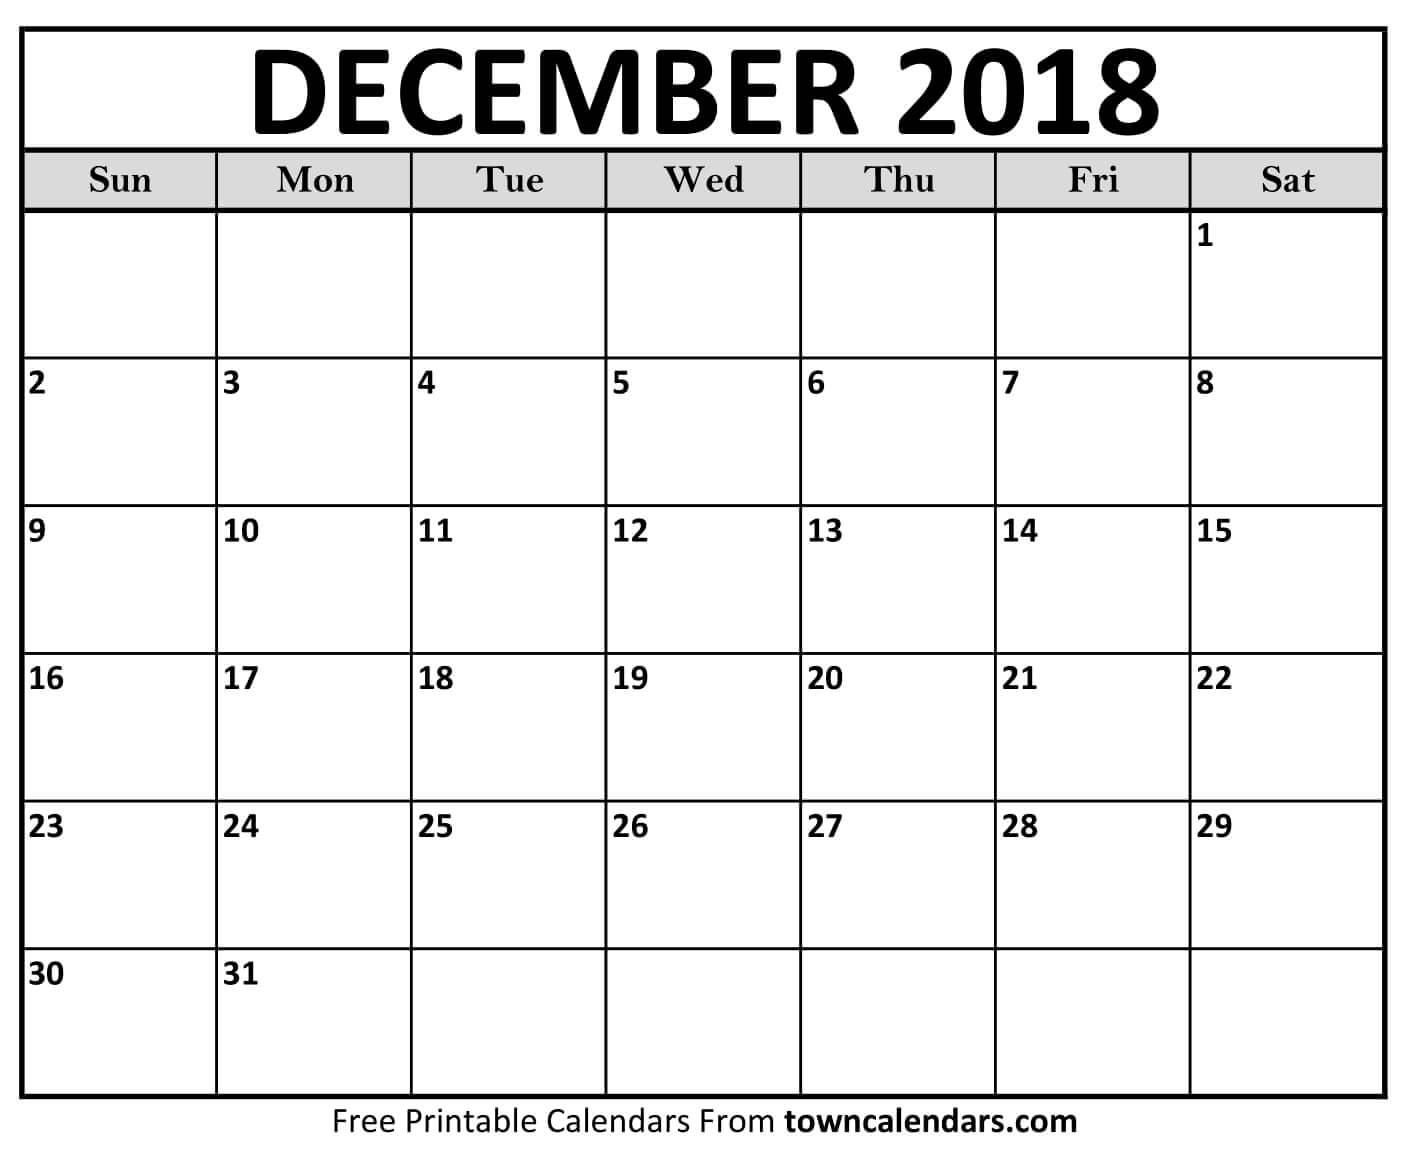 Monthly Calendar December 2018 Template Free Download in December Printable Monthly Calendar Templates